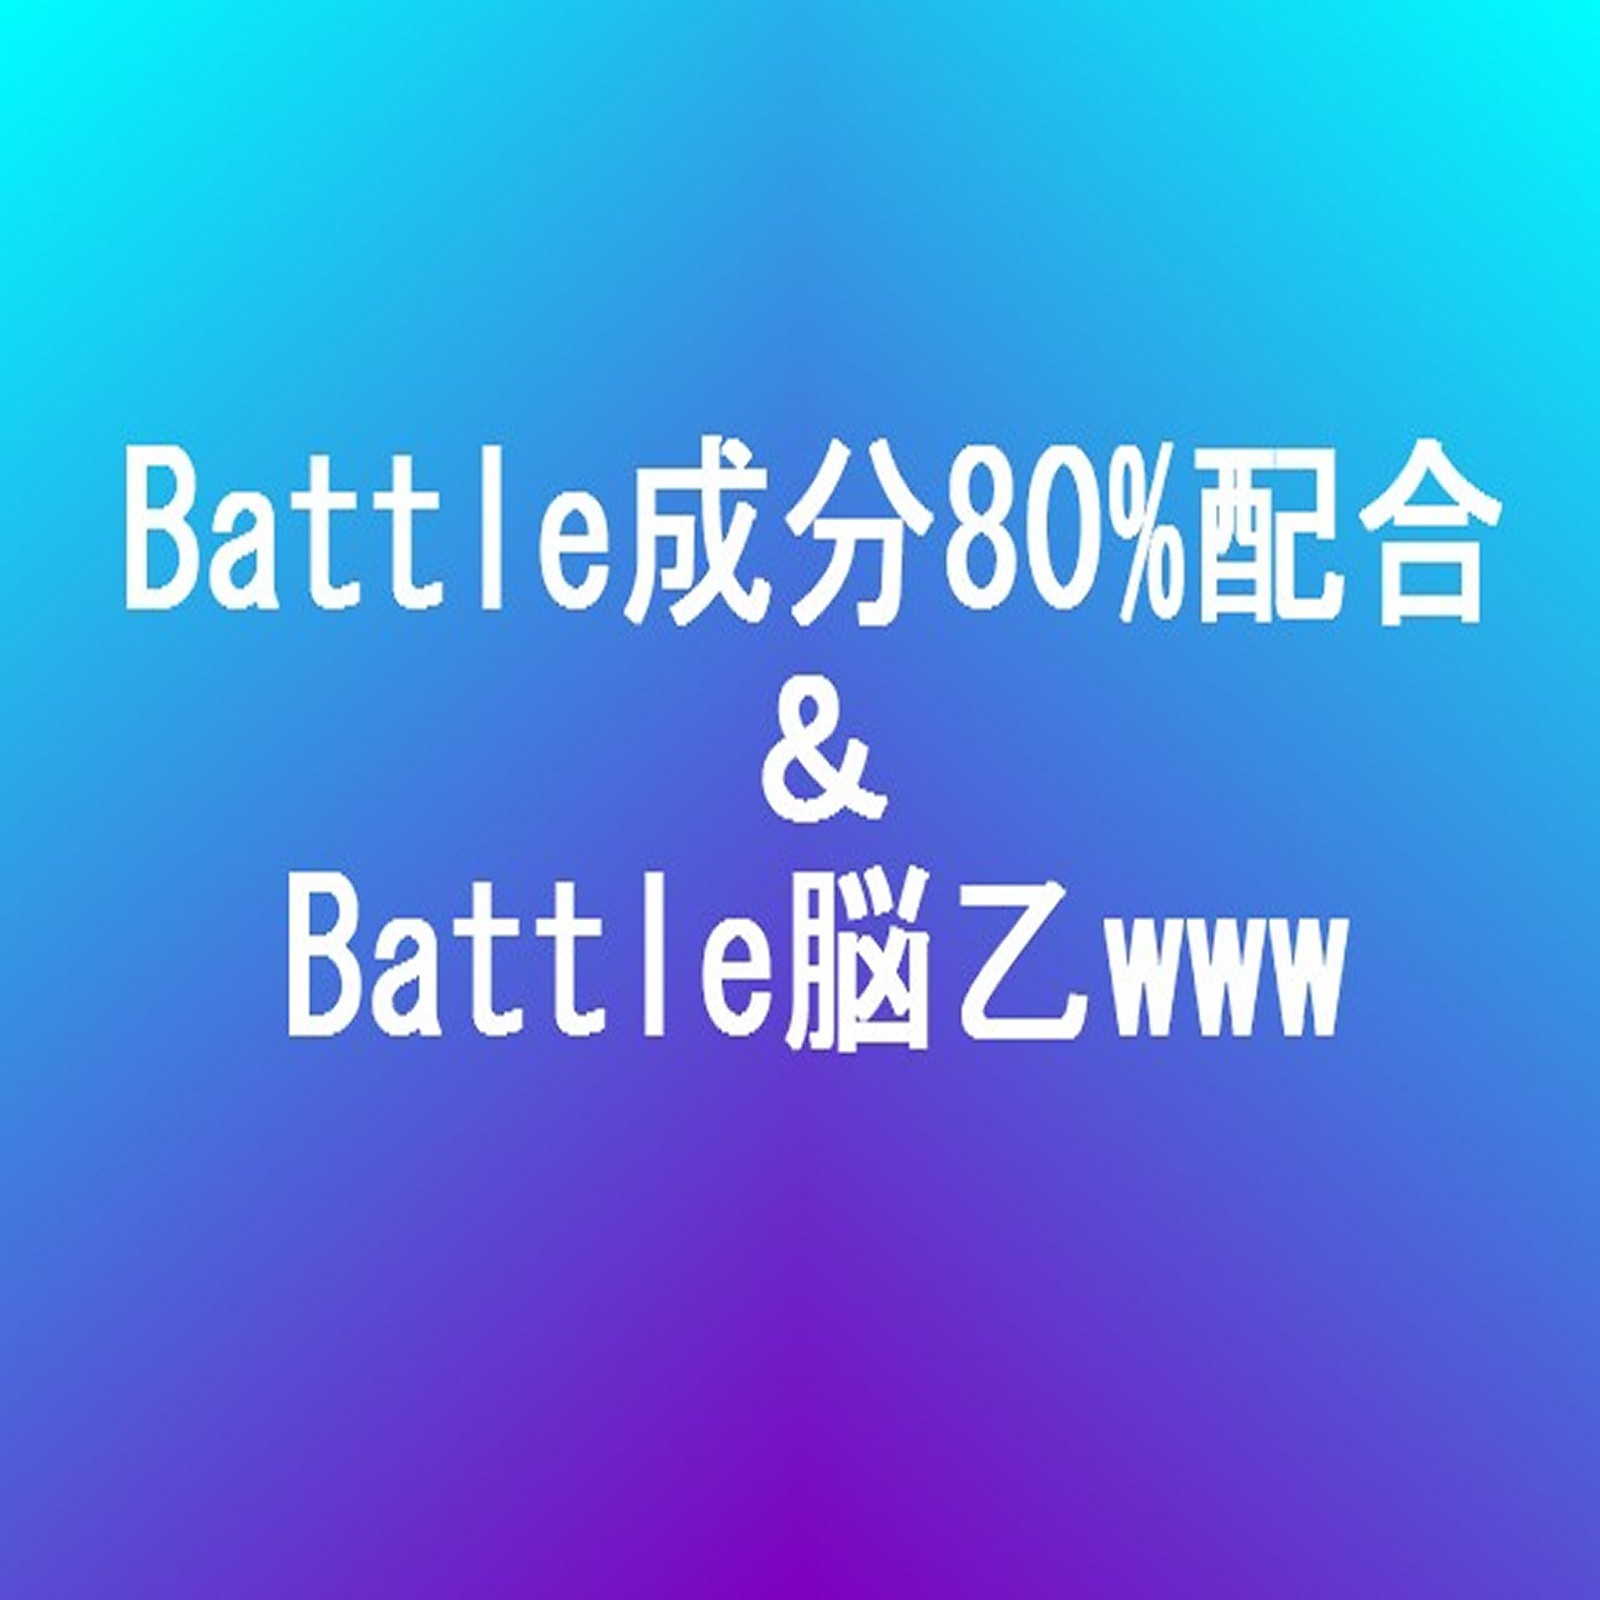 Image.jpeg?sr.dw=286&sr